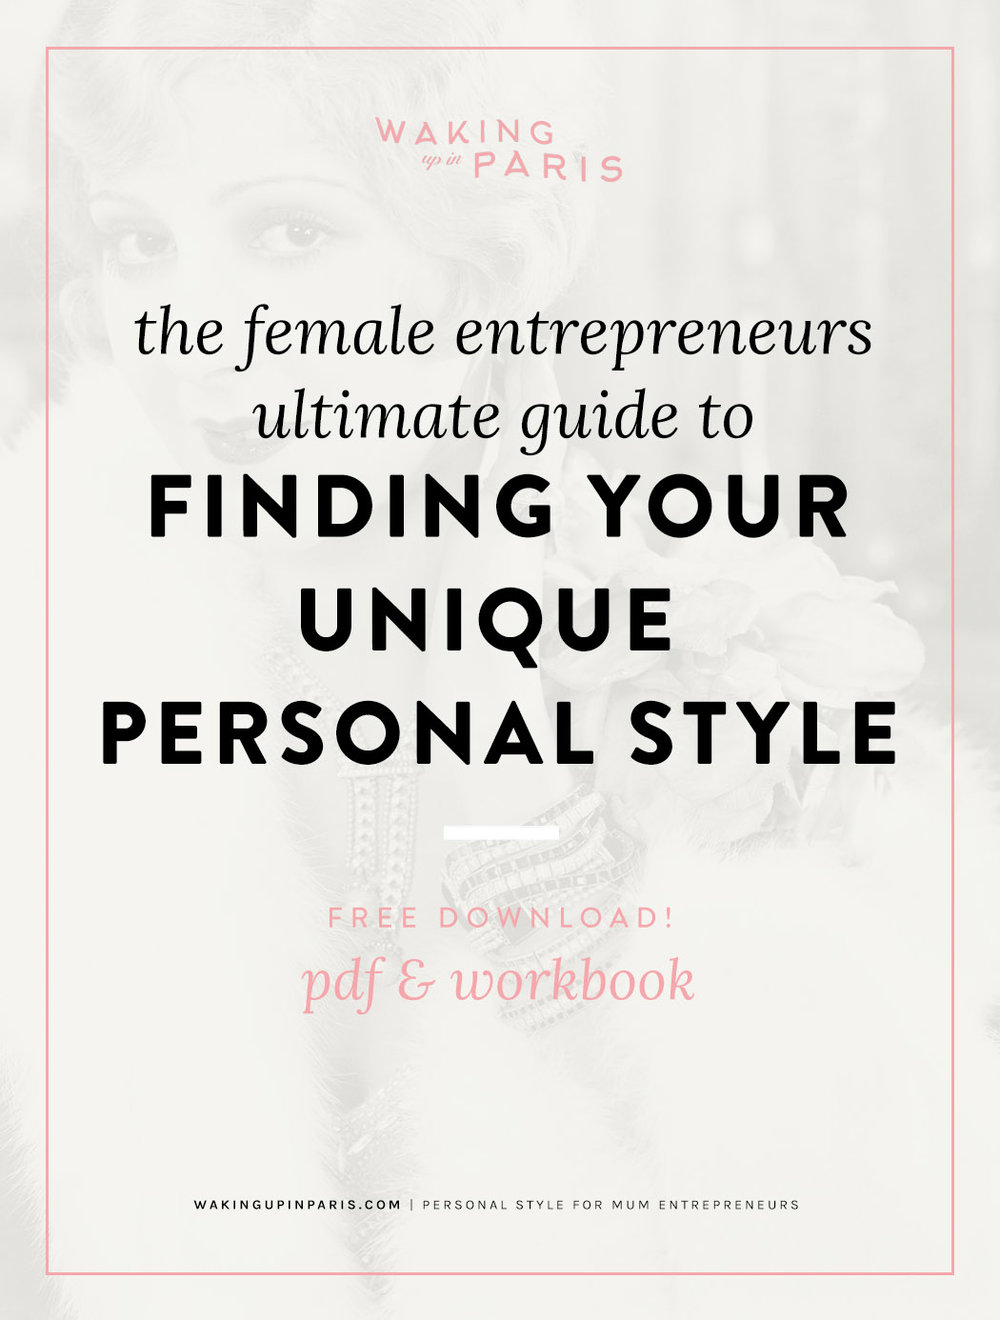 WUIP-clarissa-grace-personal-style-coach-online-mum-entrepreneur-business-finding-unique-personal-style.jpg